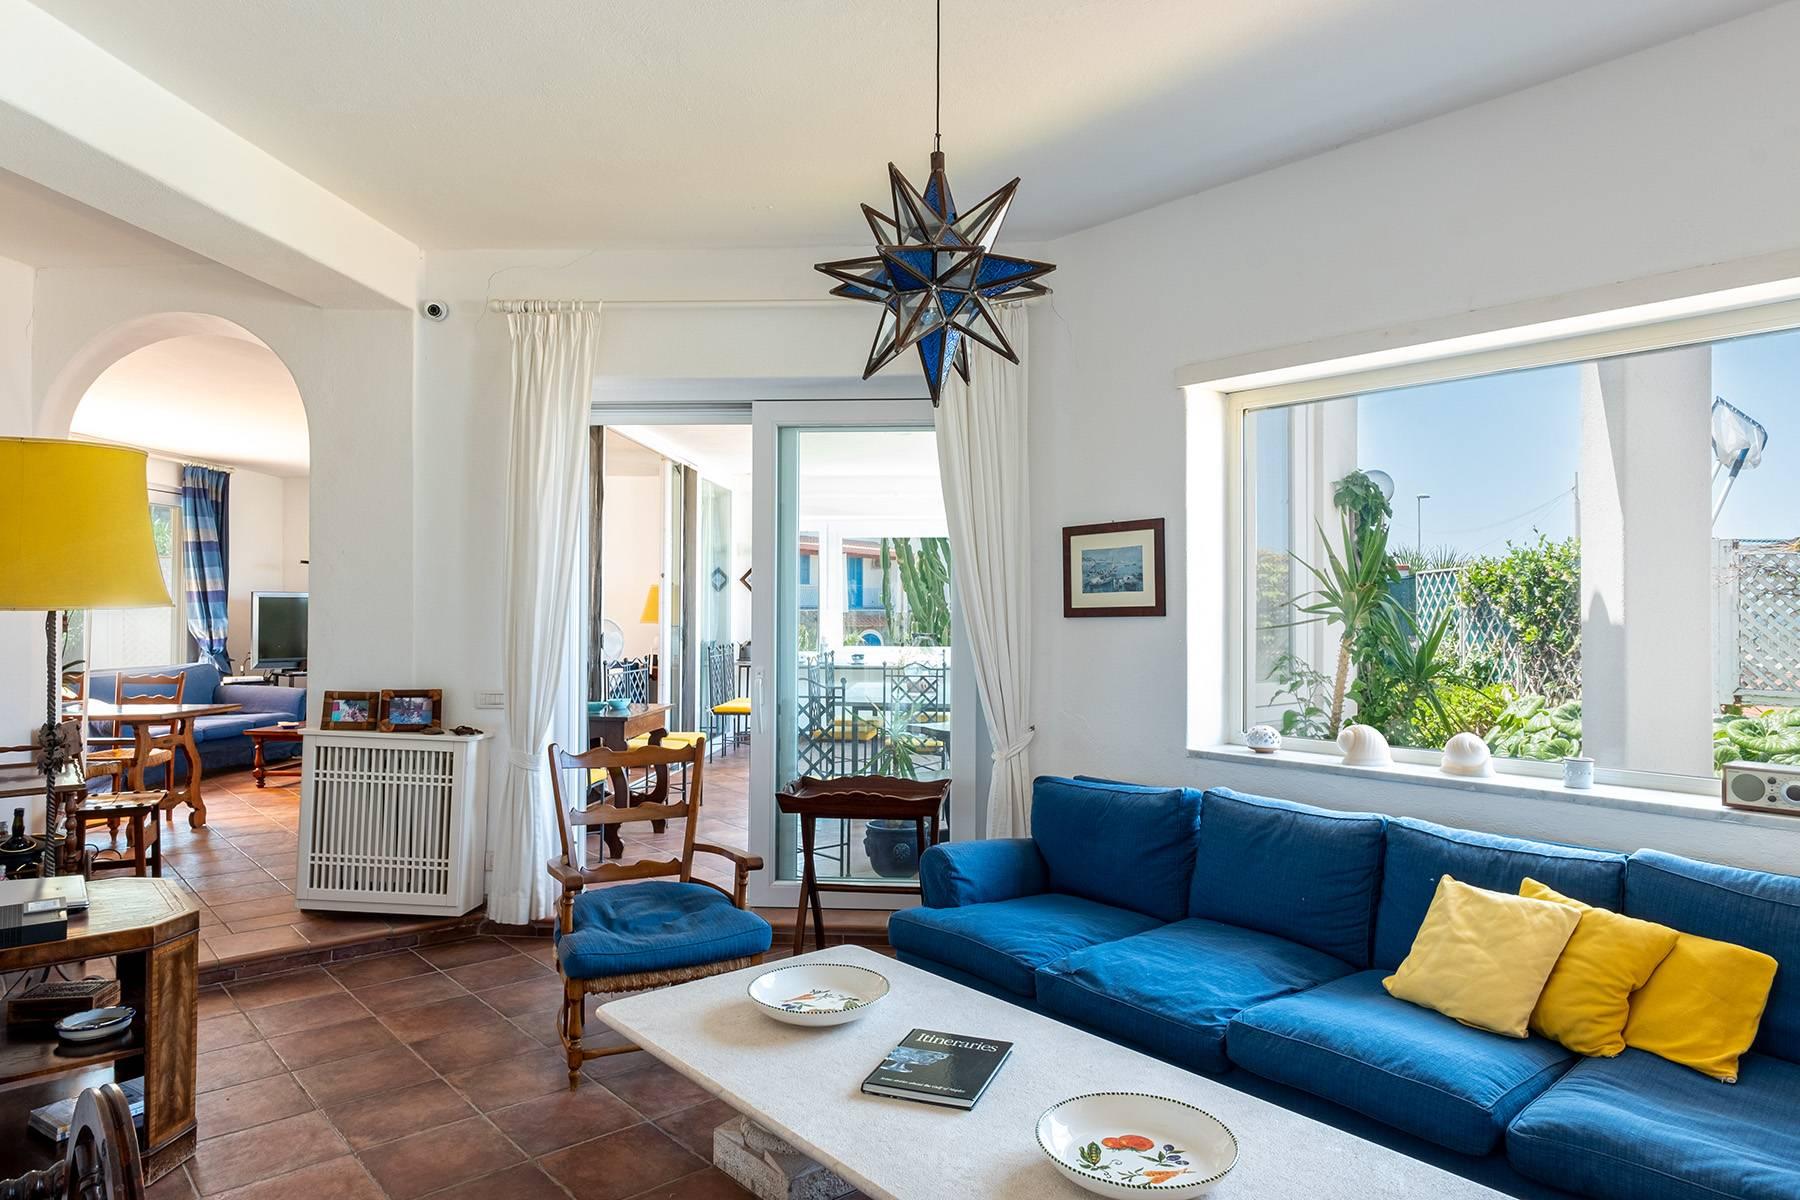 Villa in Vendita a Ischia: 5 locali, 400 mq - Foto 4